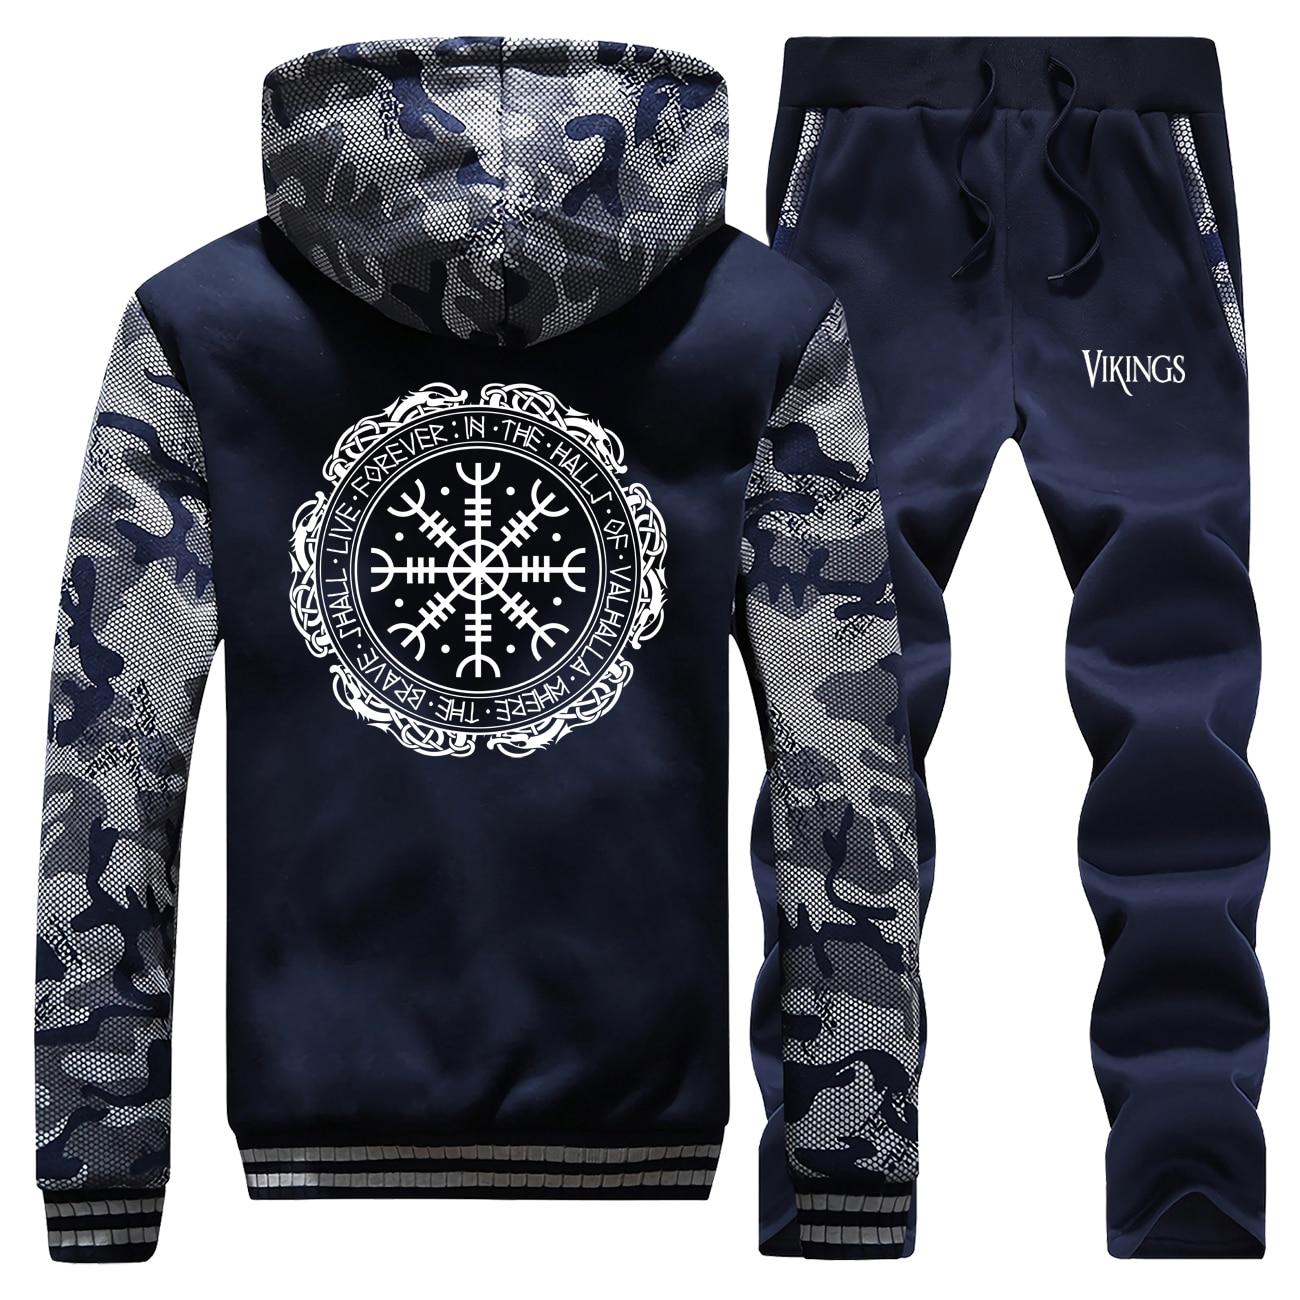 Viking Valhalla Odin Coat Men Warm Suit Fleece Hoodies Sweatshirt Set Winter Jacket+Pants 2 Piece Sets Mens Camouflage Tracksuit